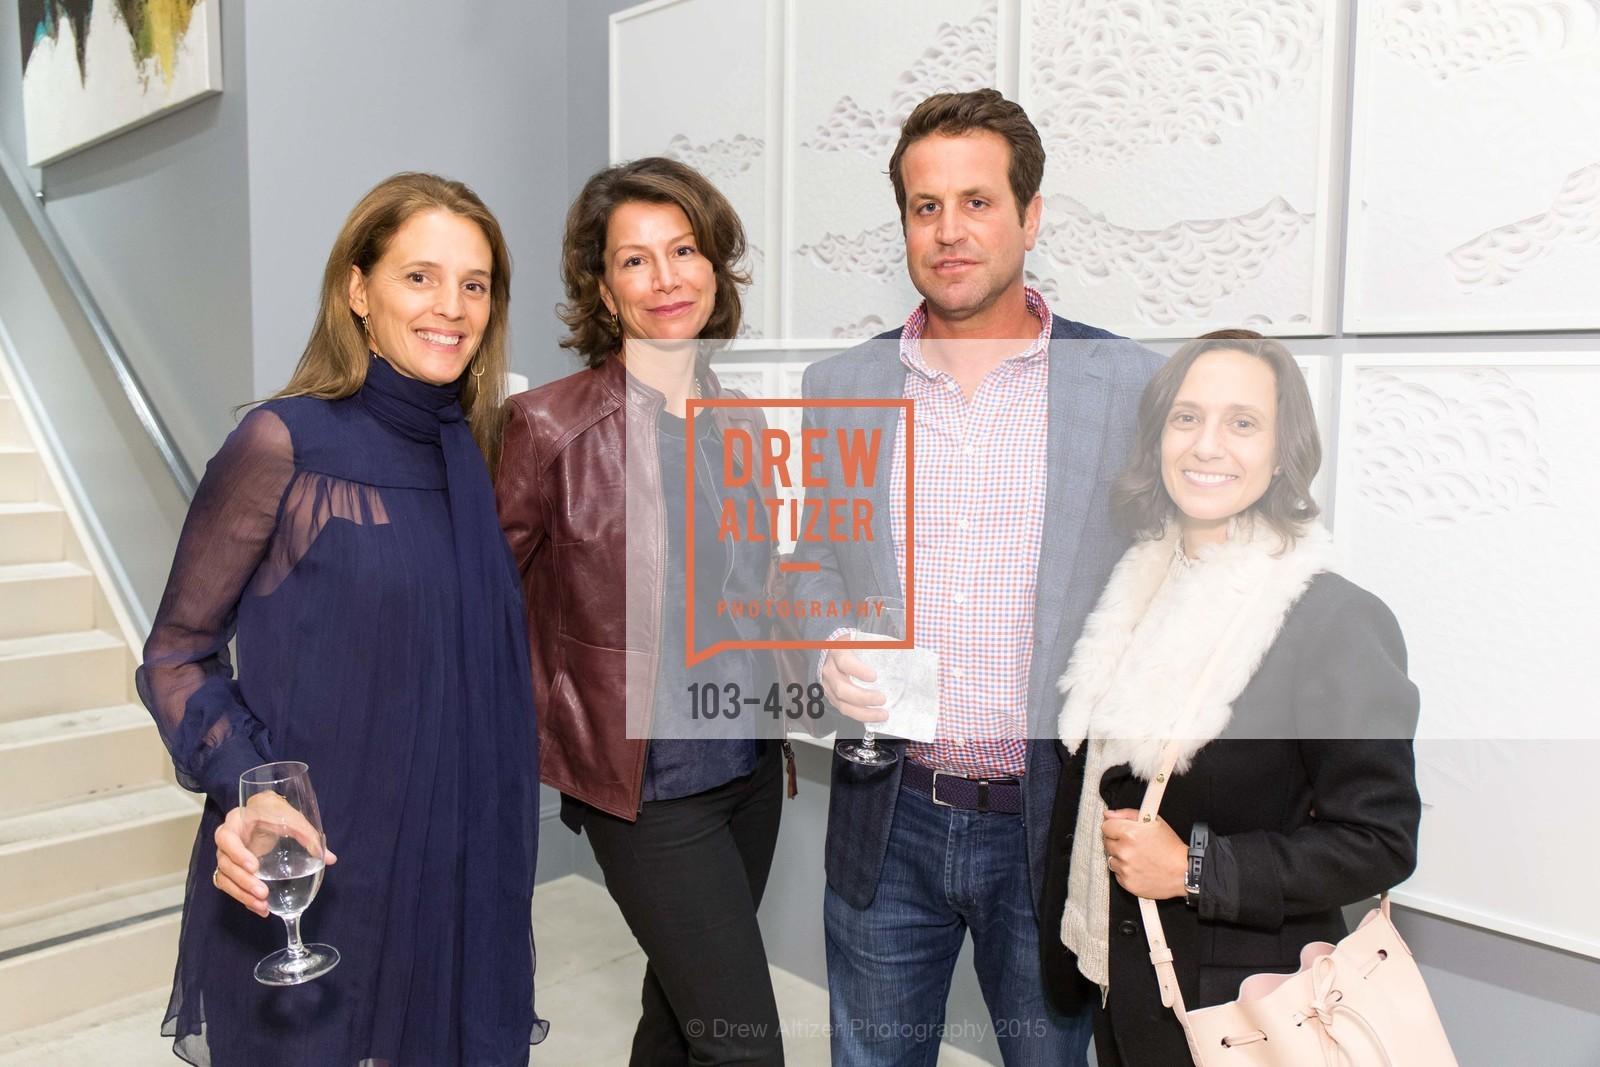 Evie Simon, Simone LaCorte, Nick Heldfond, Becca Prowda, Stephanie Breitbard Fine Arts San Francisco Opening, Stephanie Breitbard Fine Arts. 843 Montgomery St, November 4th, 2015